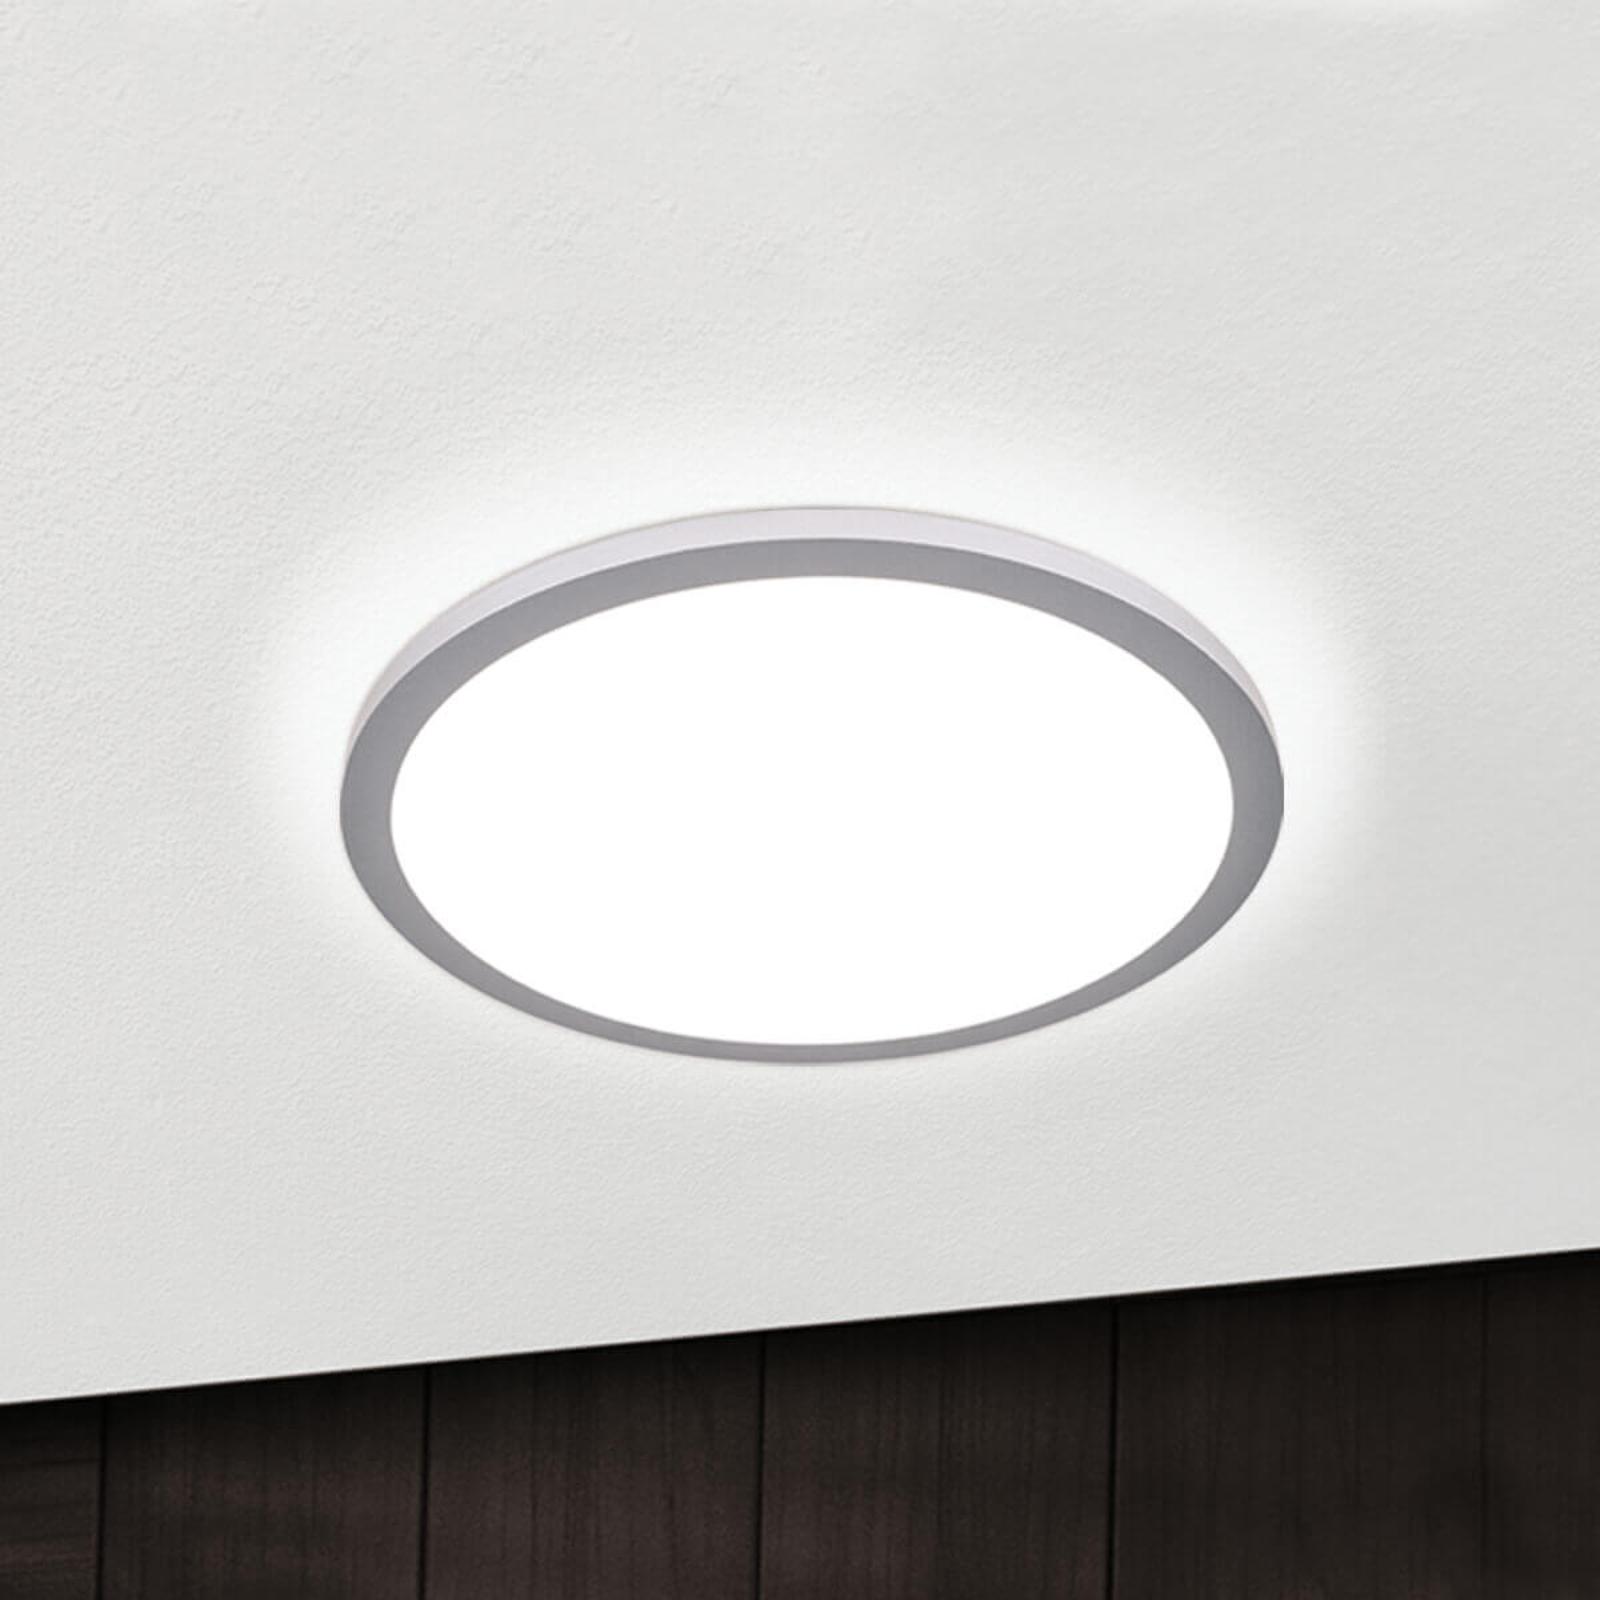 Titanfarbene LED-Deckenlampe Aria, dimmbar - 40 cm